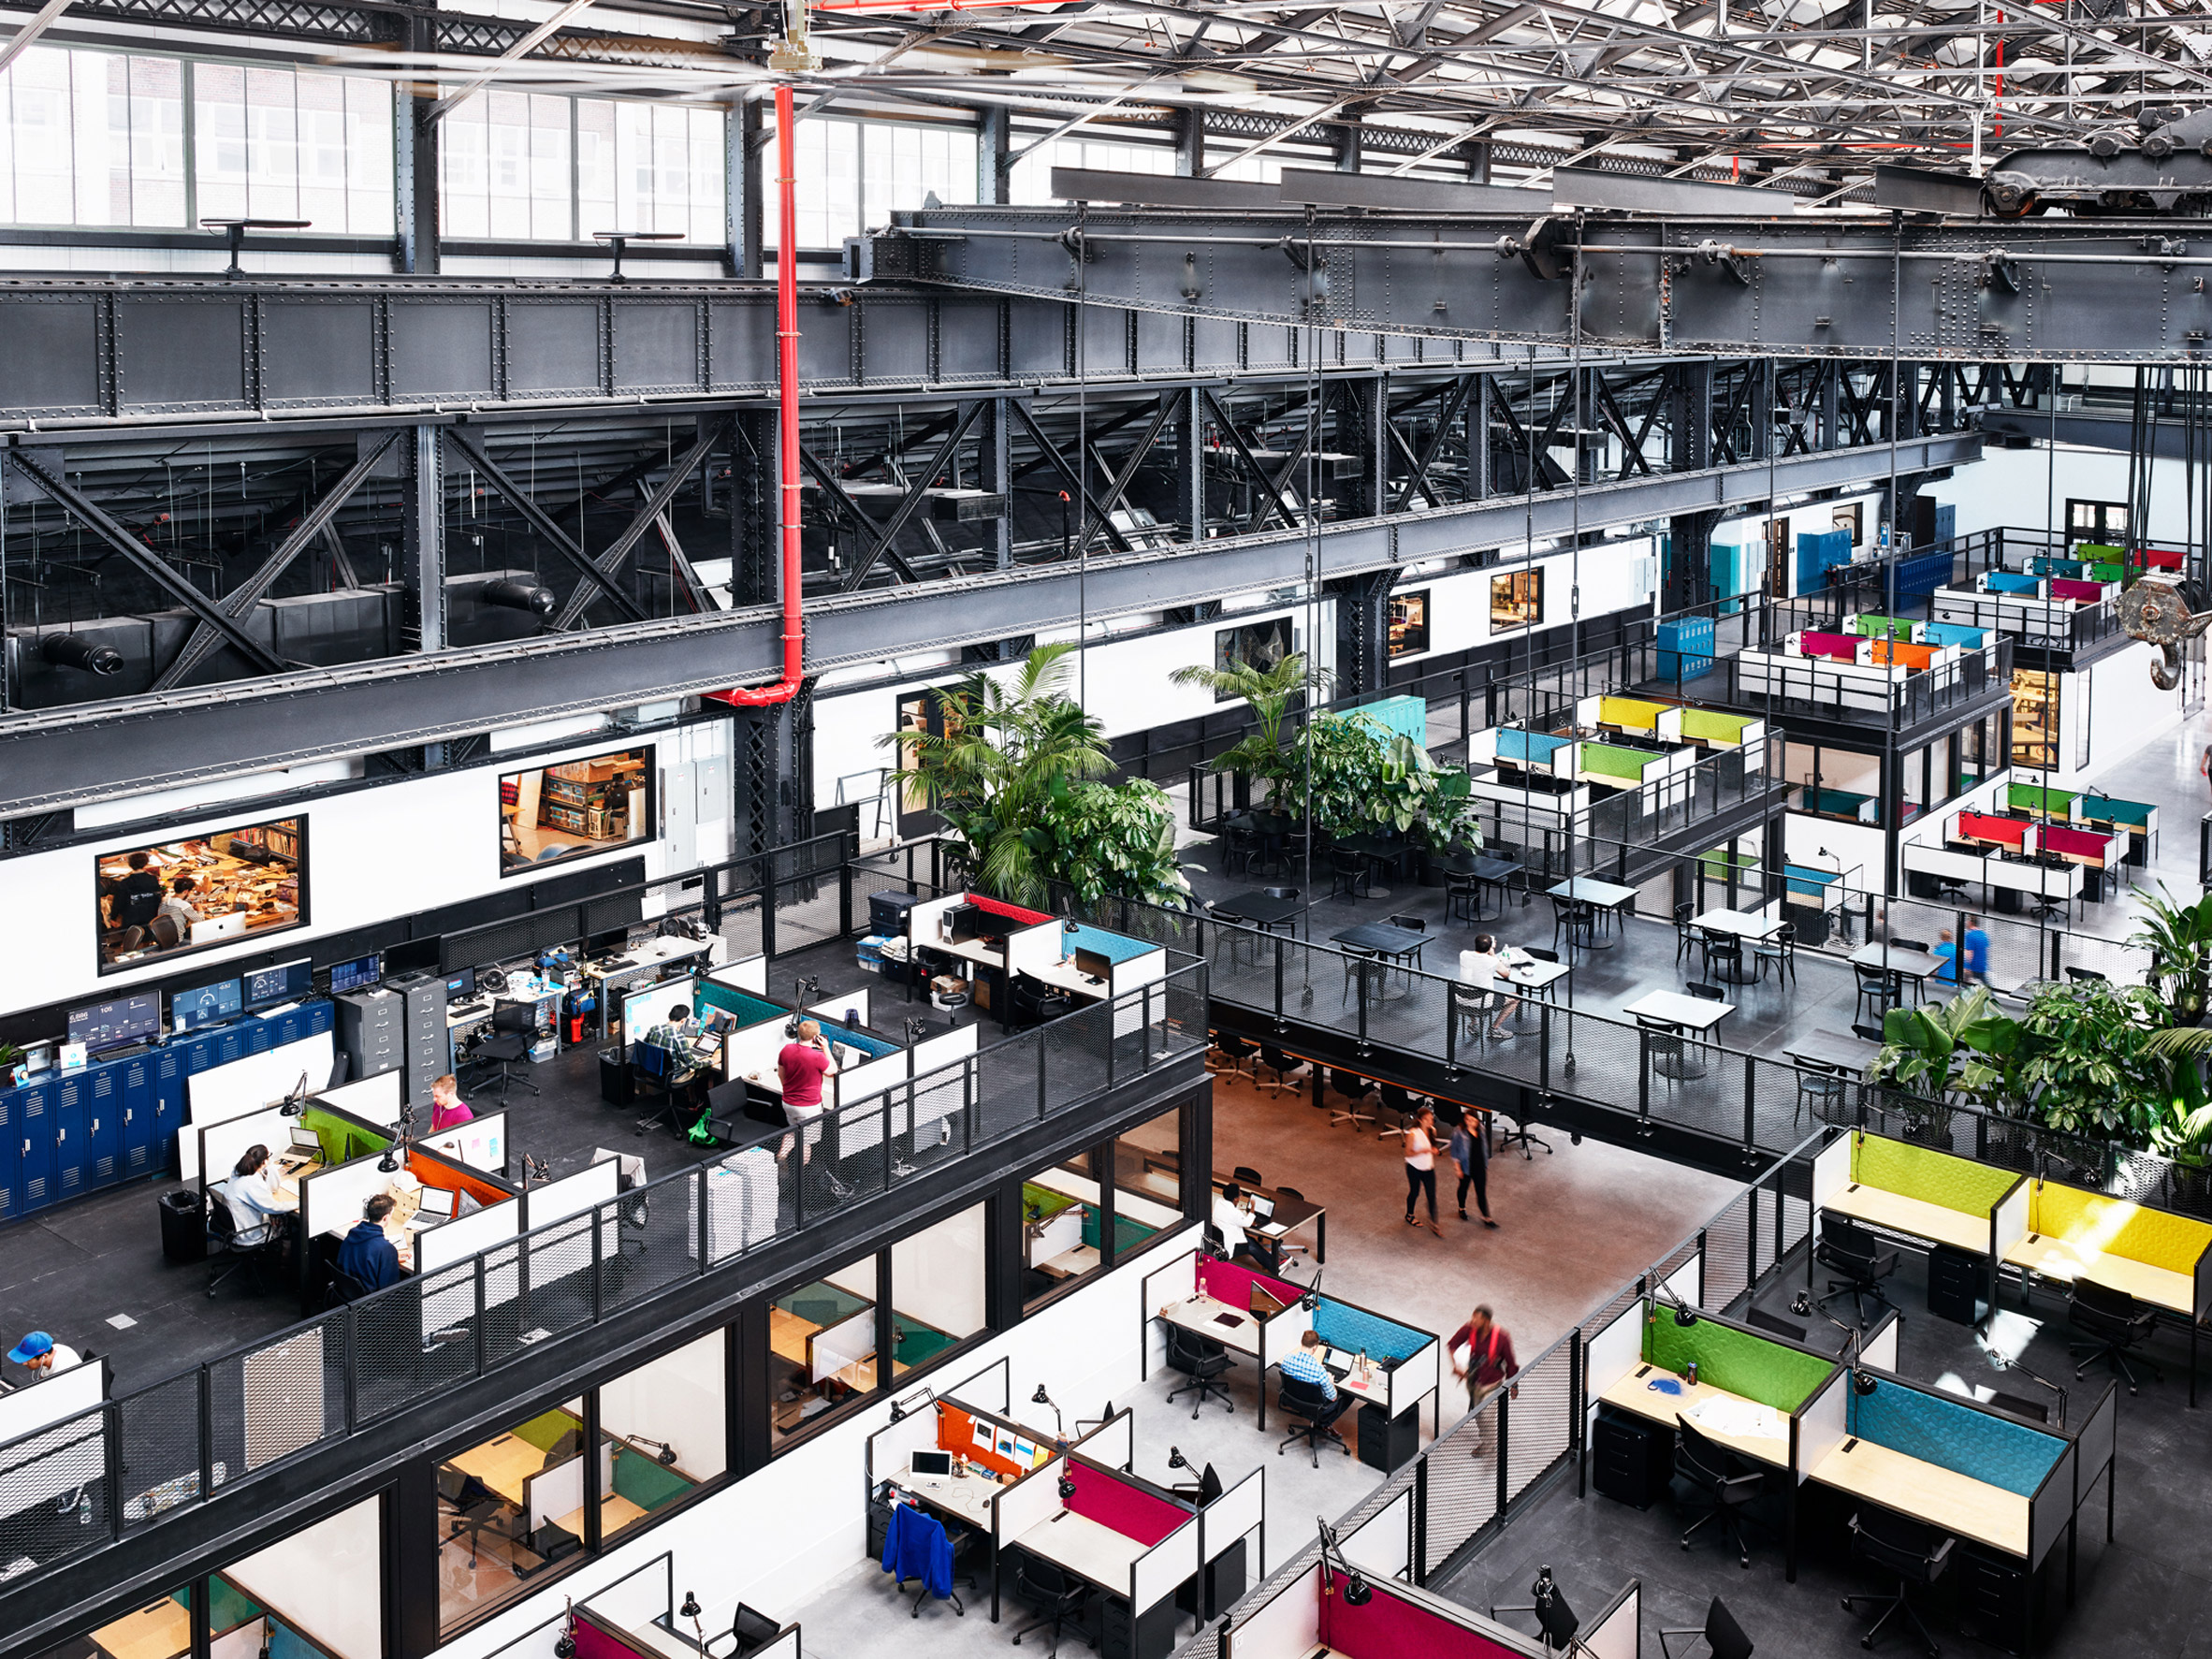 new-lab-design-technology-centre-architecture-marco-sea-brooklyn-navy-yard-new-york-usa_dezeen_2364_col_0